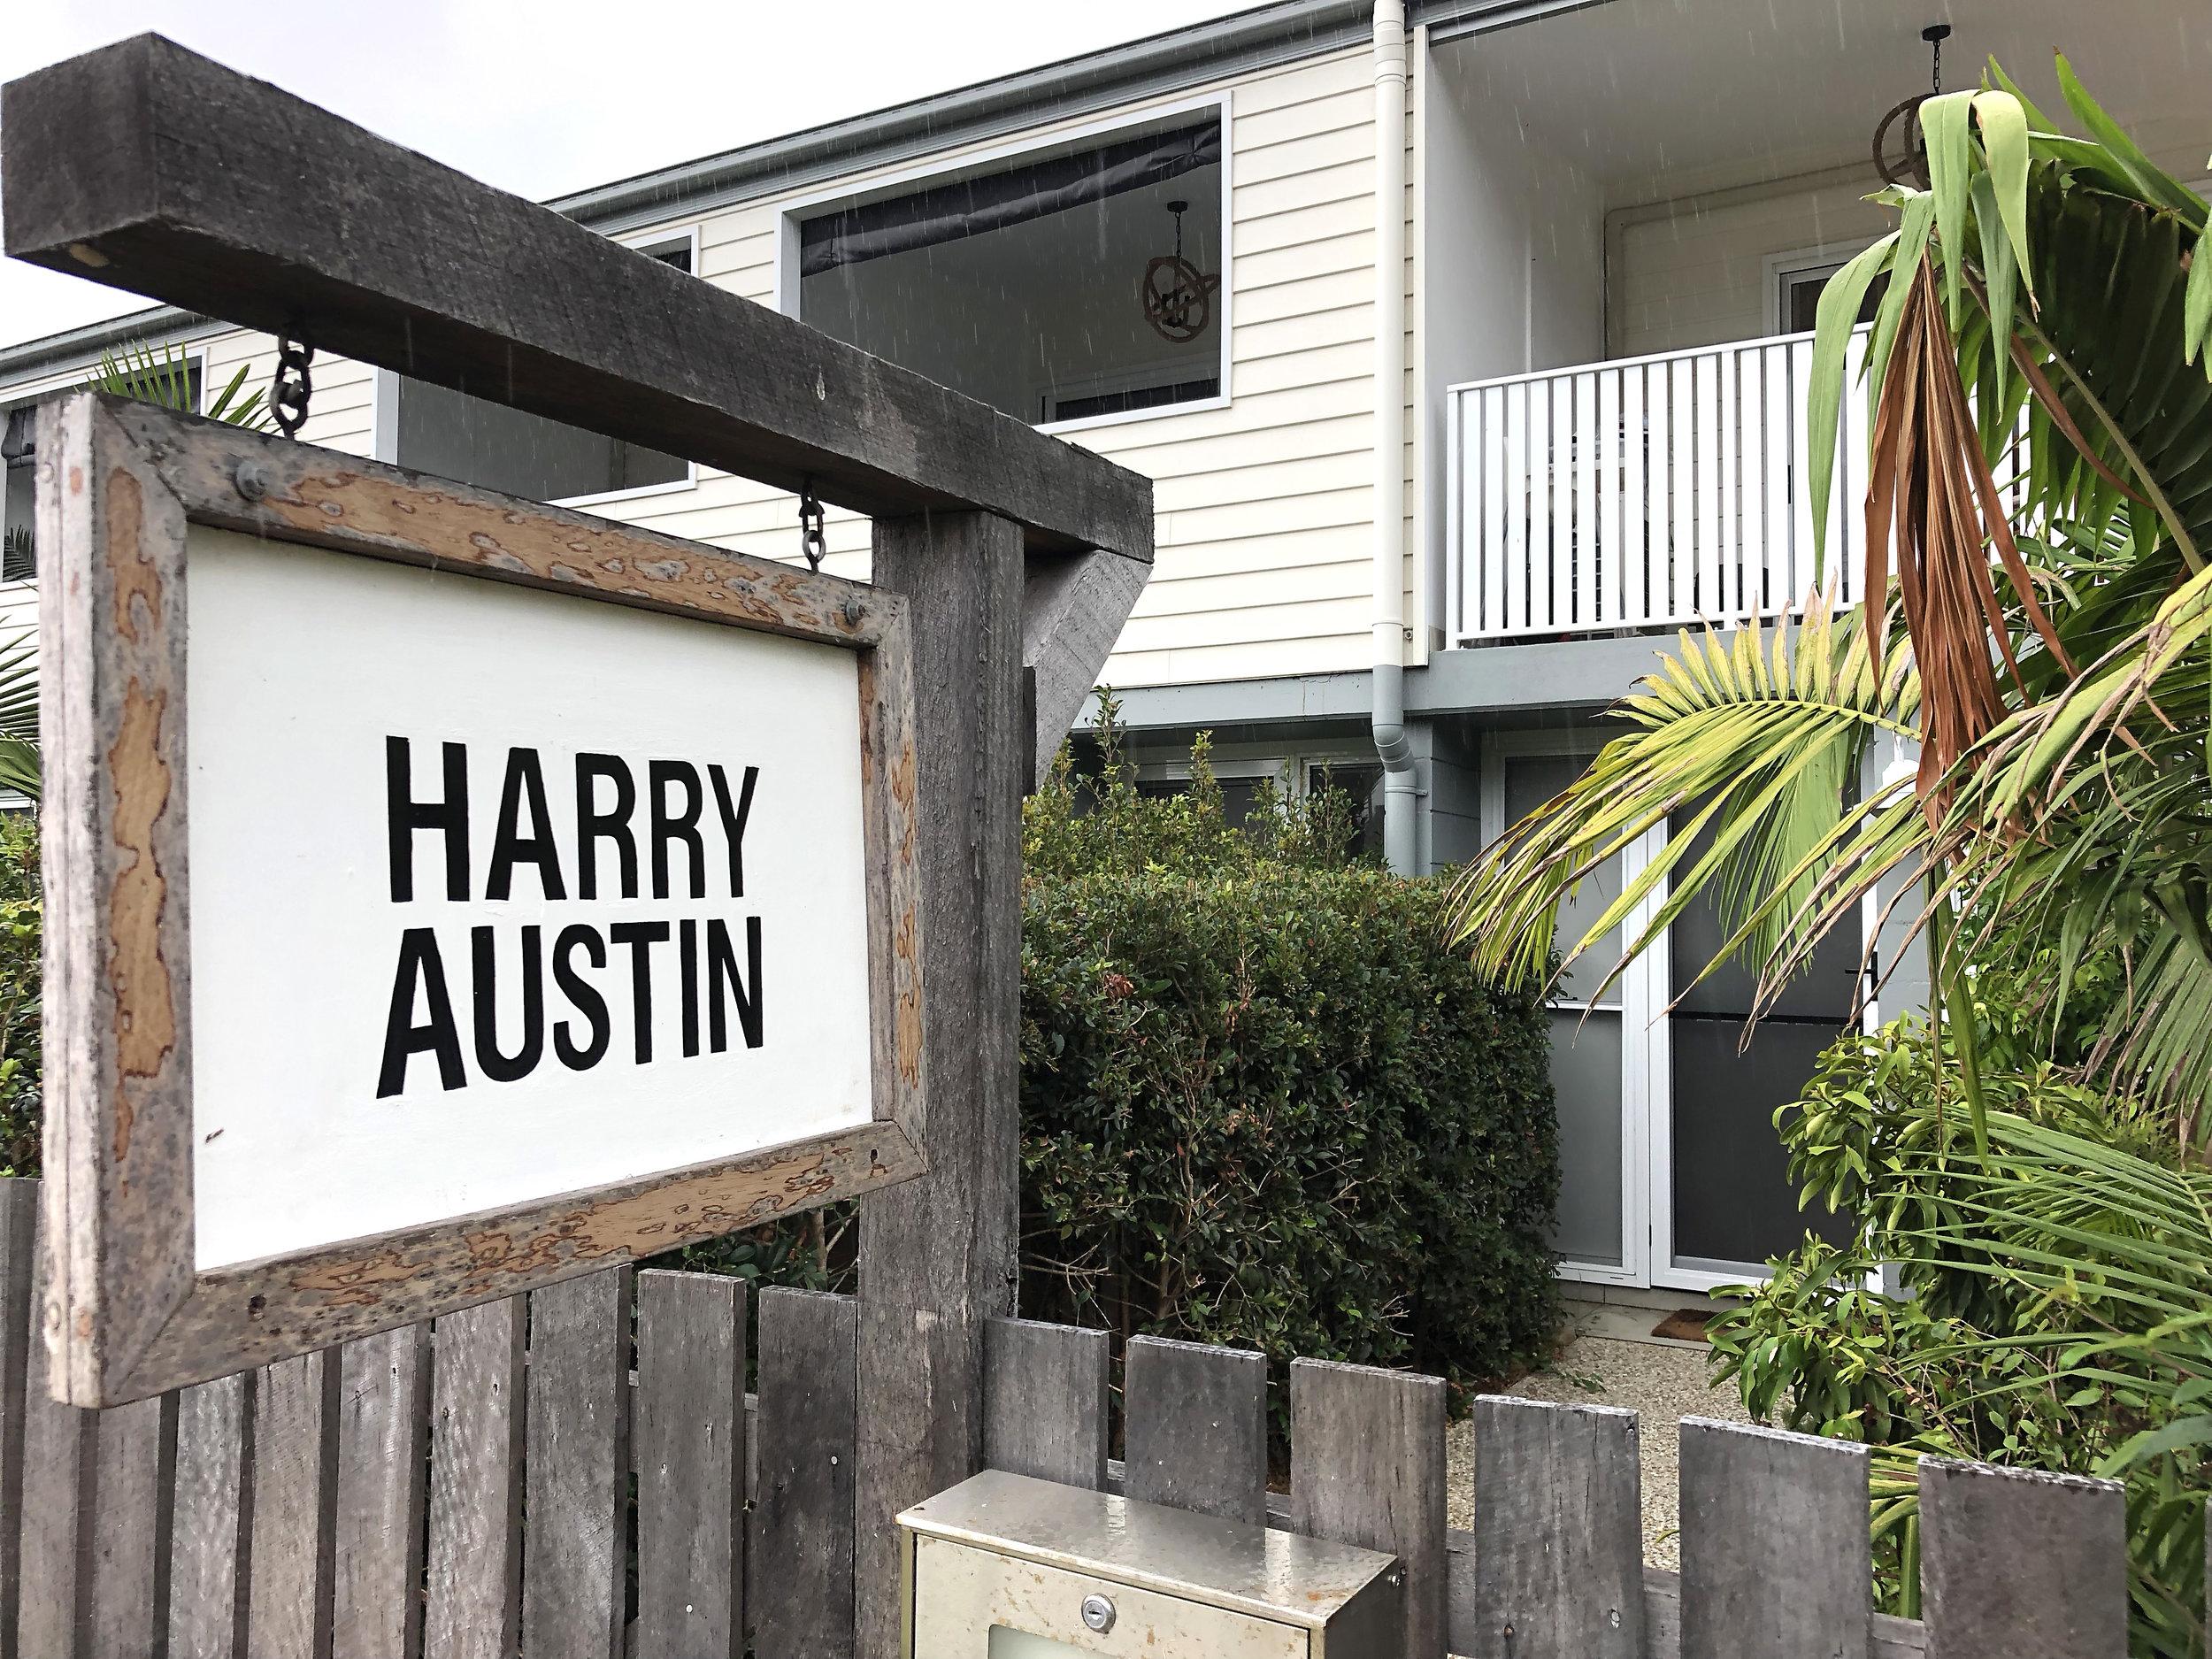 Harry Austin Sign Installed.jpg